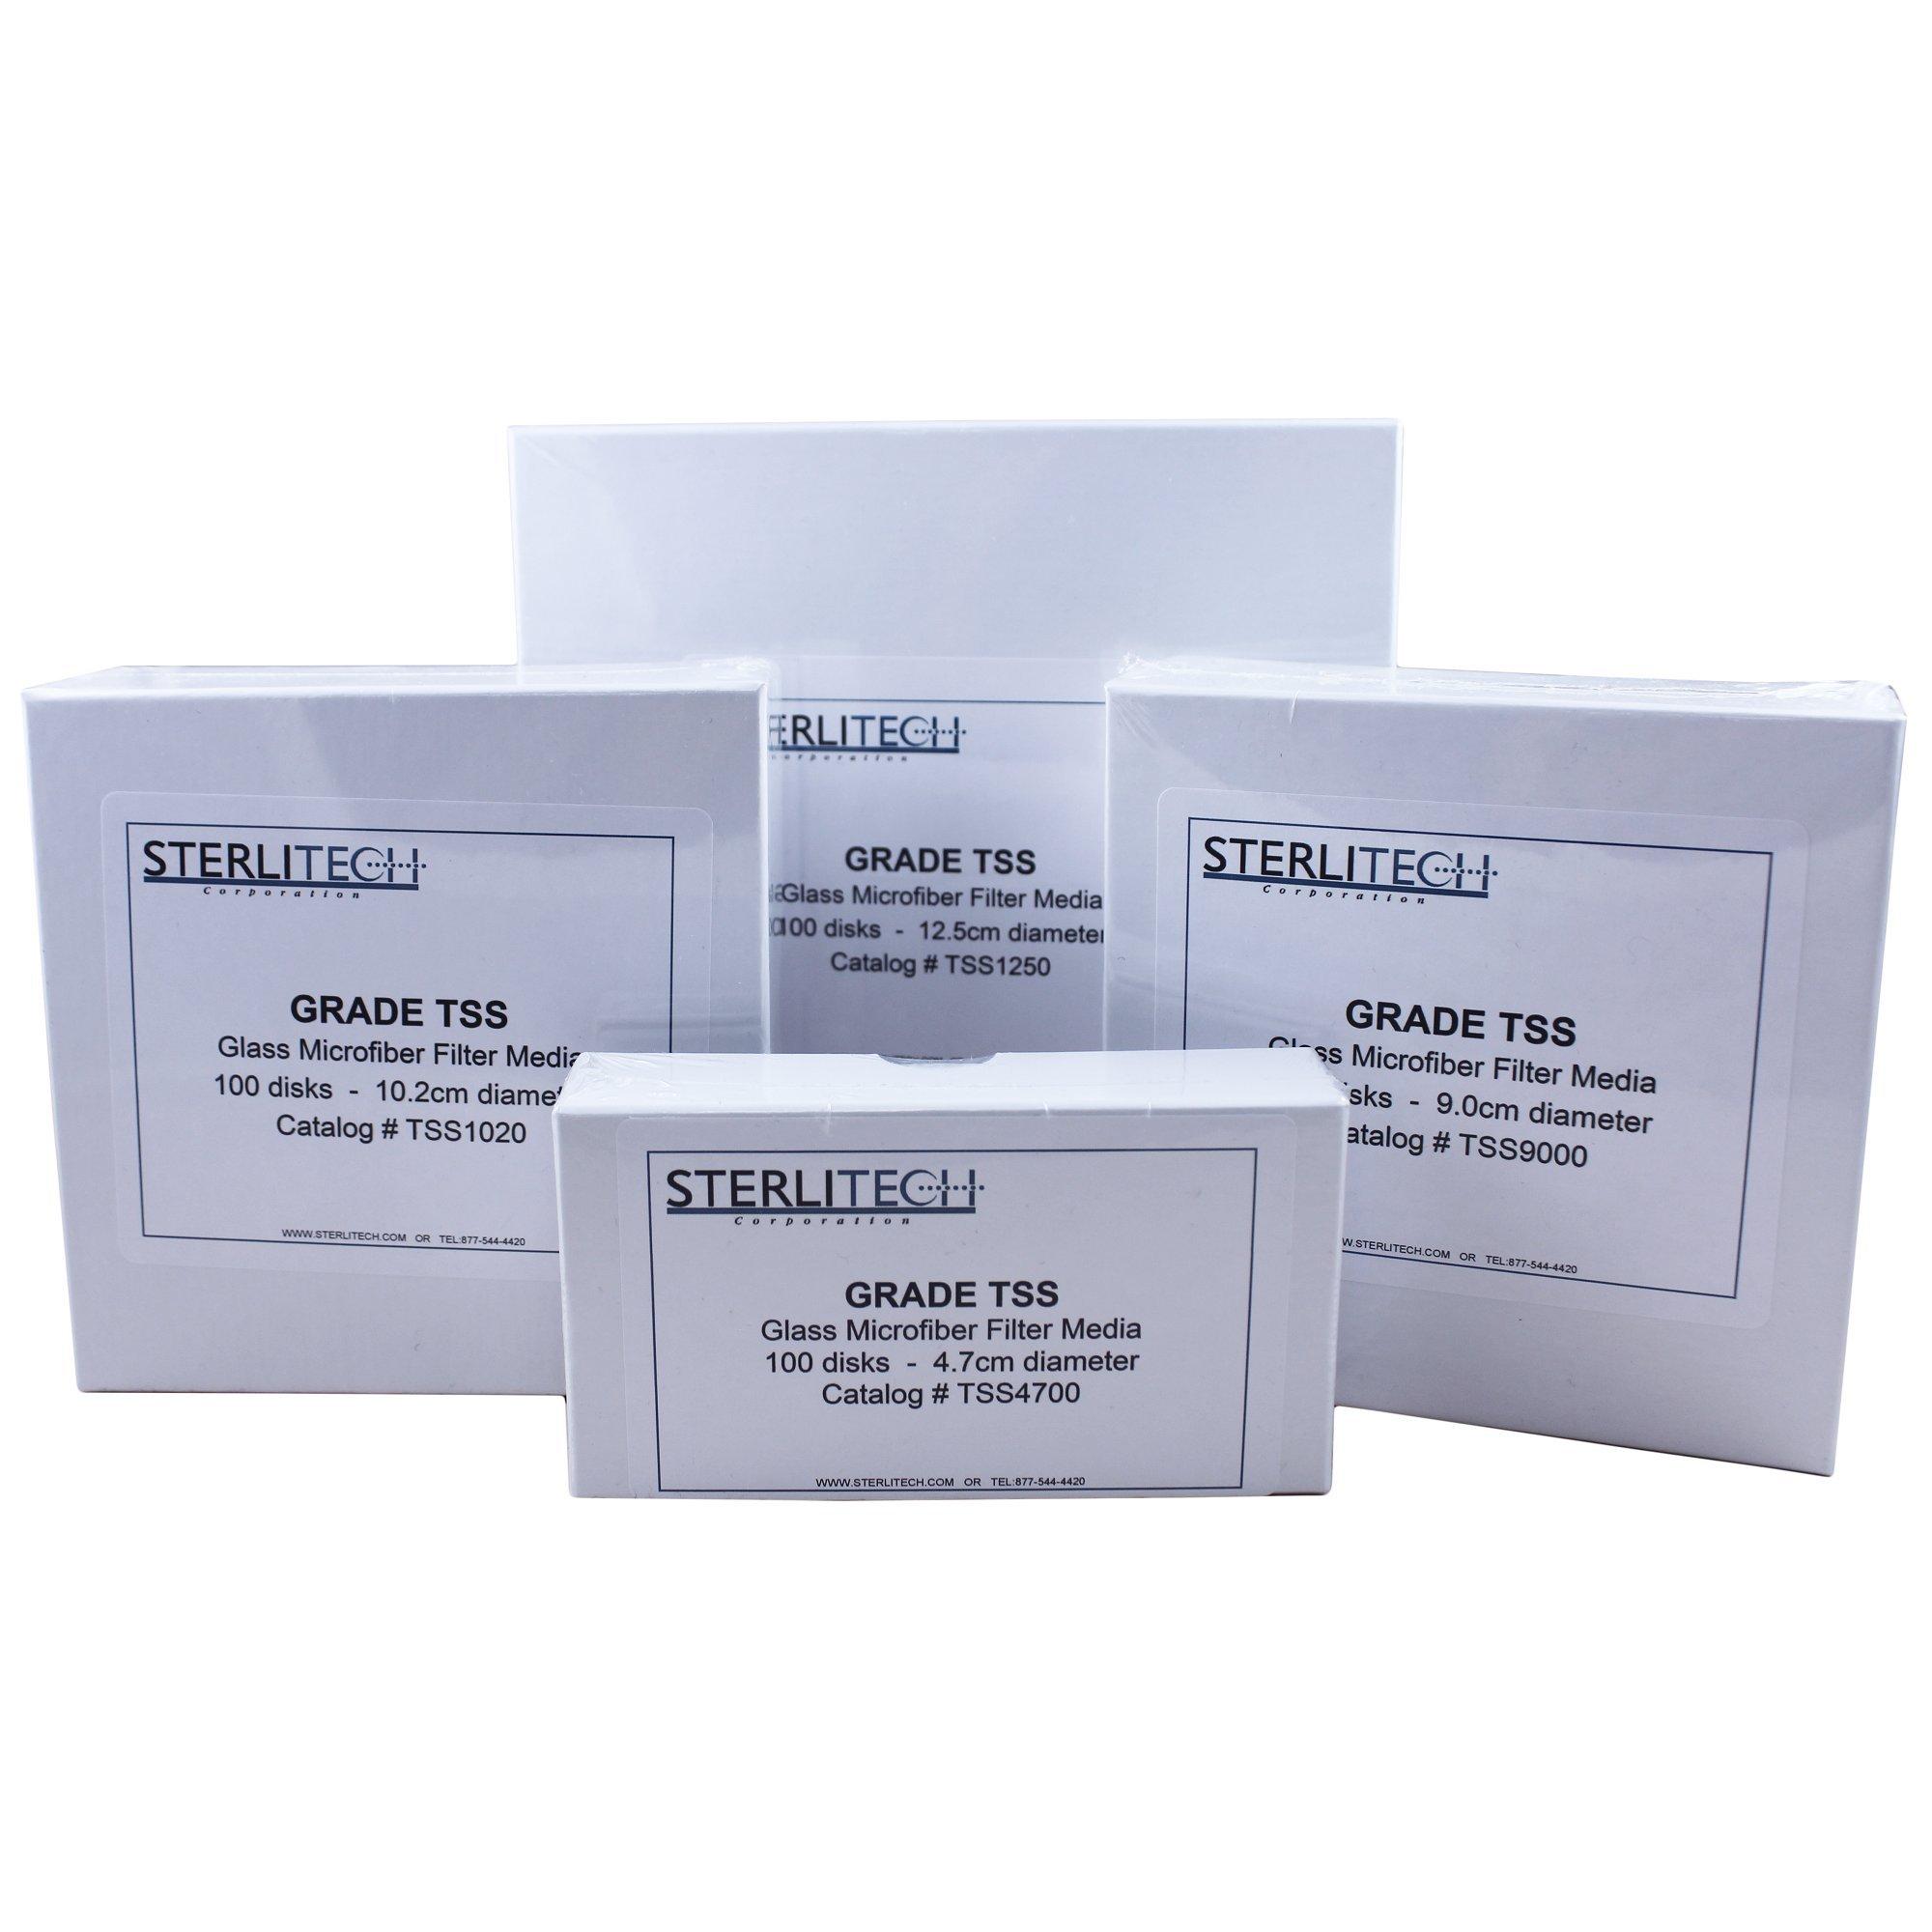 Grade TSS Borosilicate Glass Fiber Filter, 1.5um, 47 mm Diameter, 100/pk - TSS4700 by Sterlitech